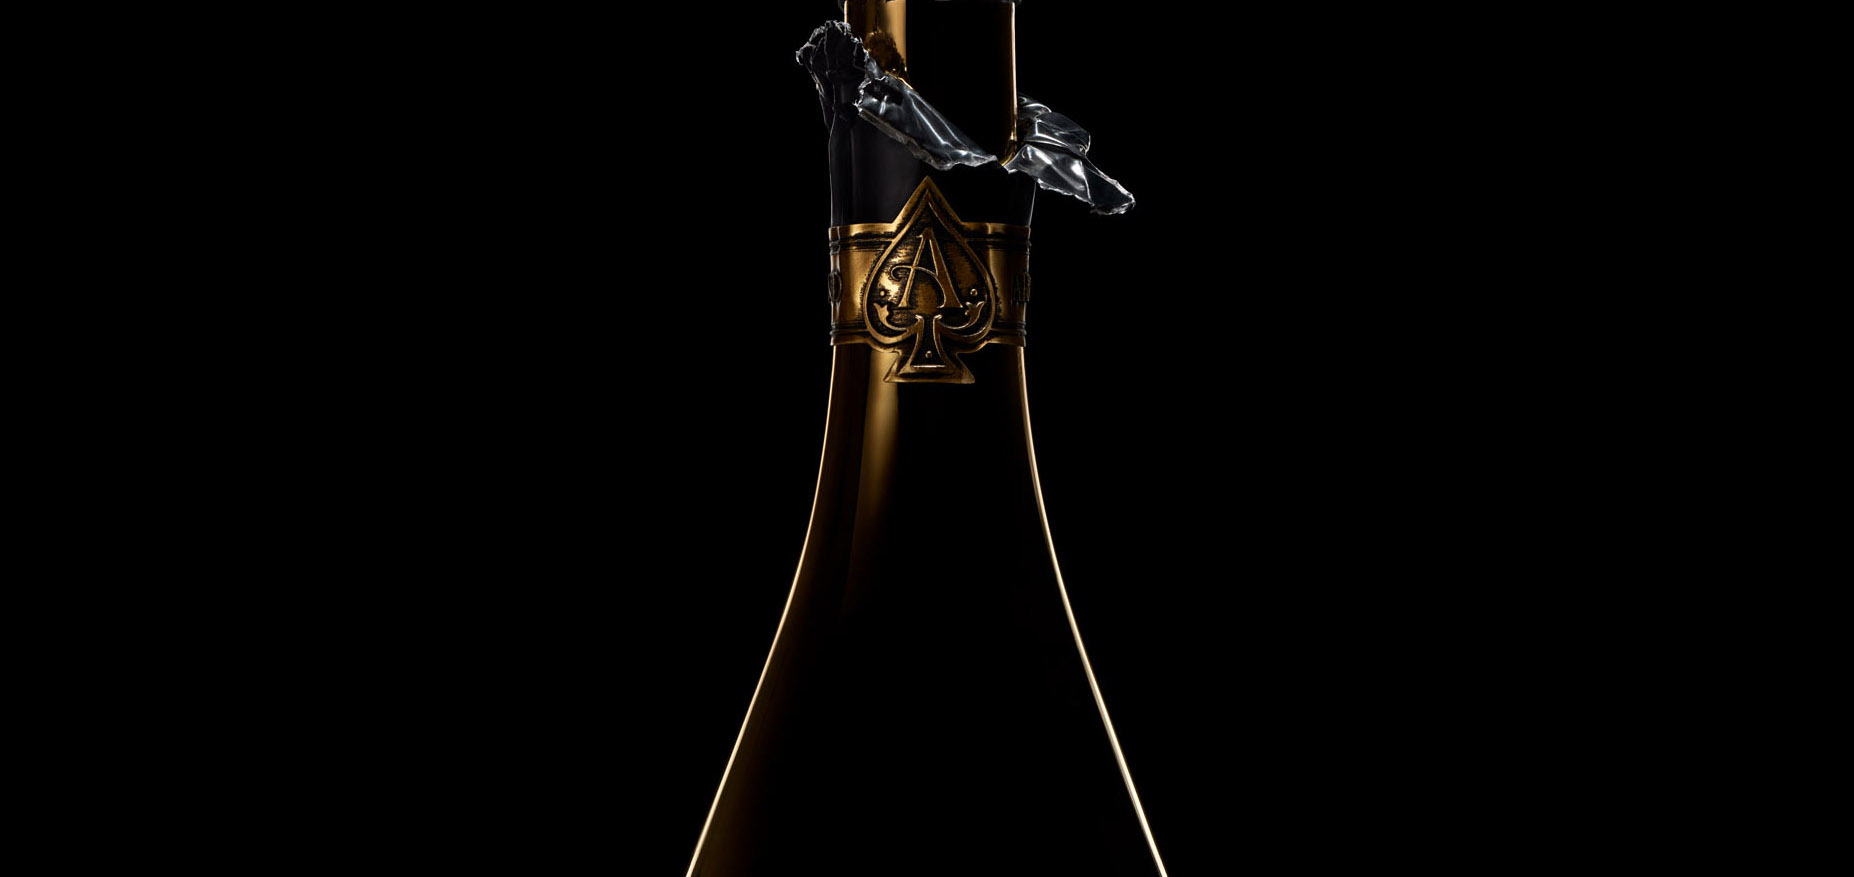 Over Armand de Brignac - Armand de Brignac Champagne